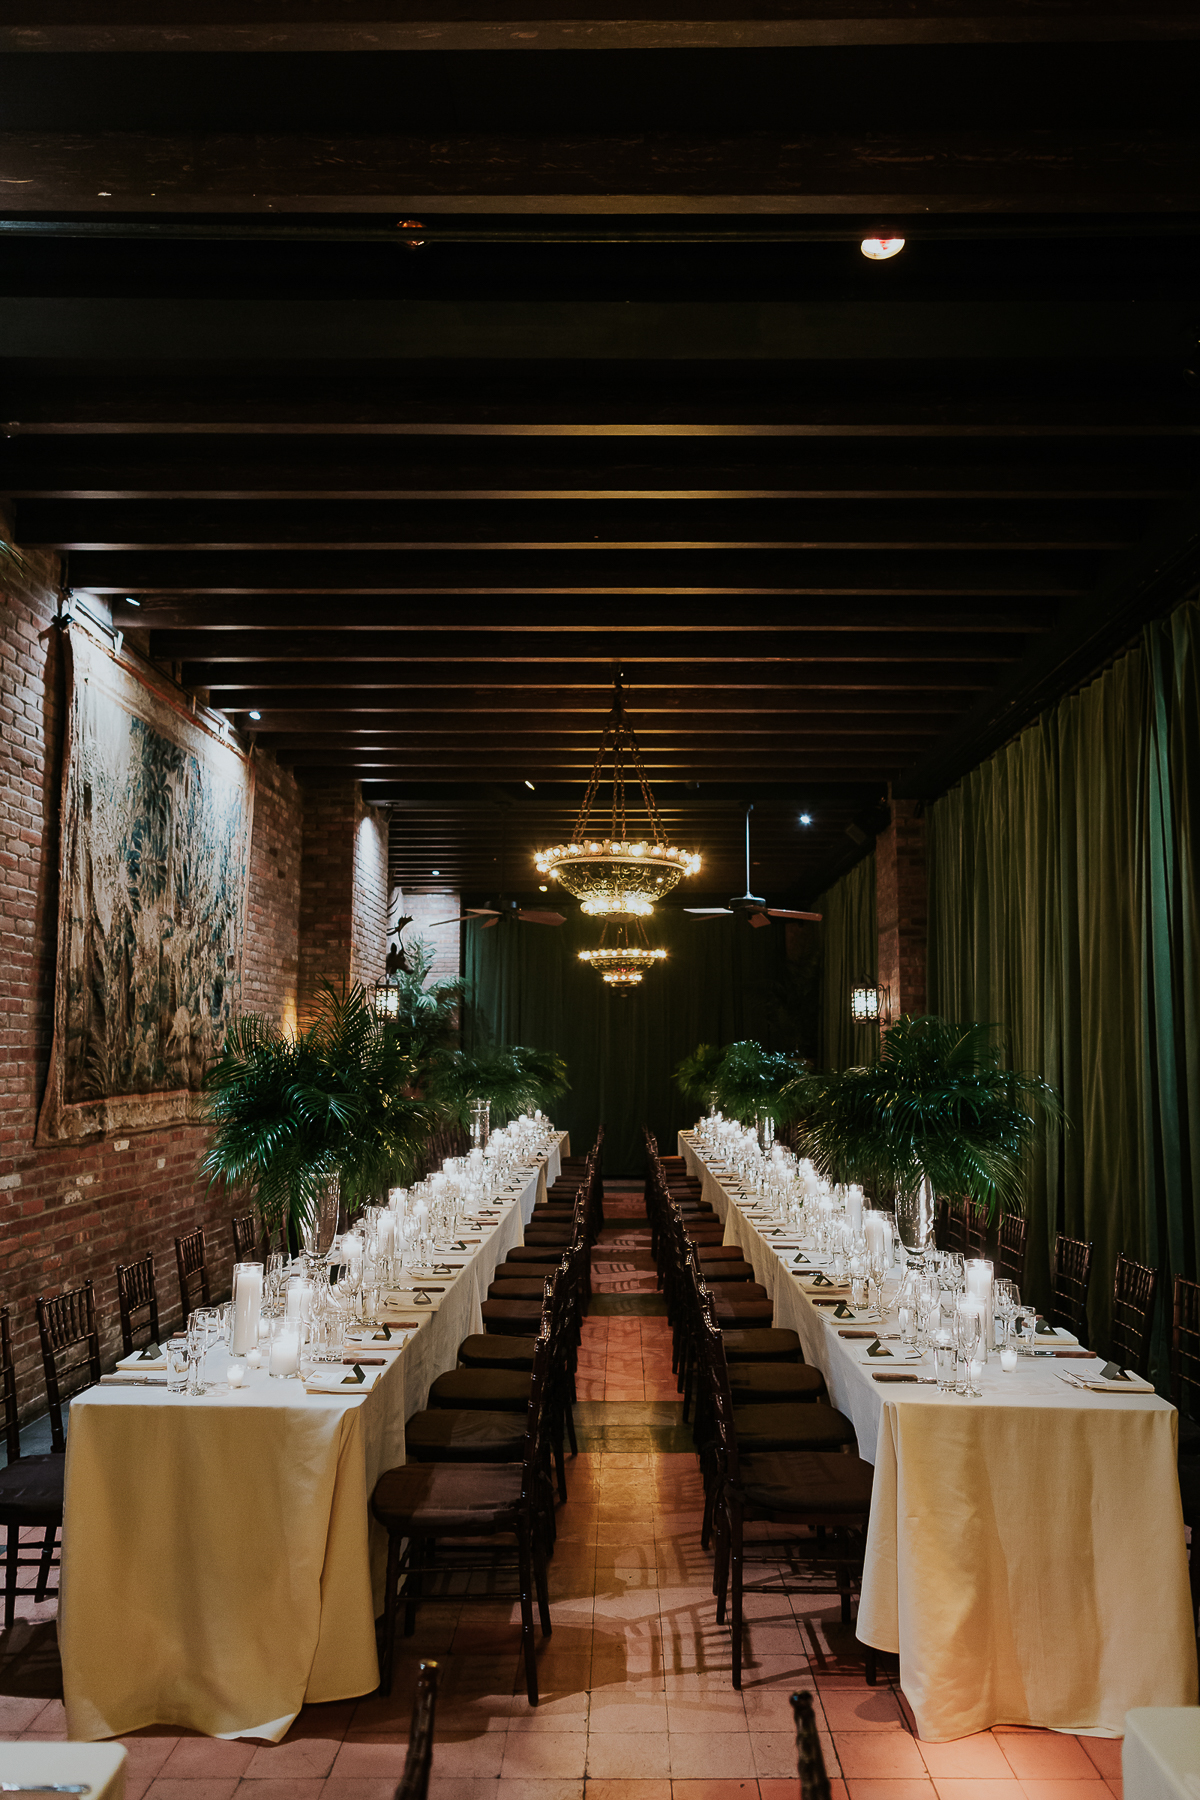 Bowery-Hotel-NYC-Documentary-Wedding-Photos-75.jpg